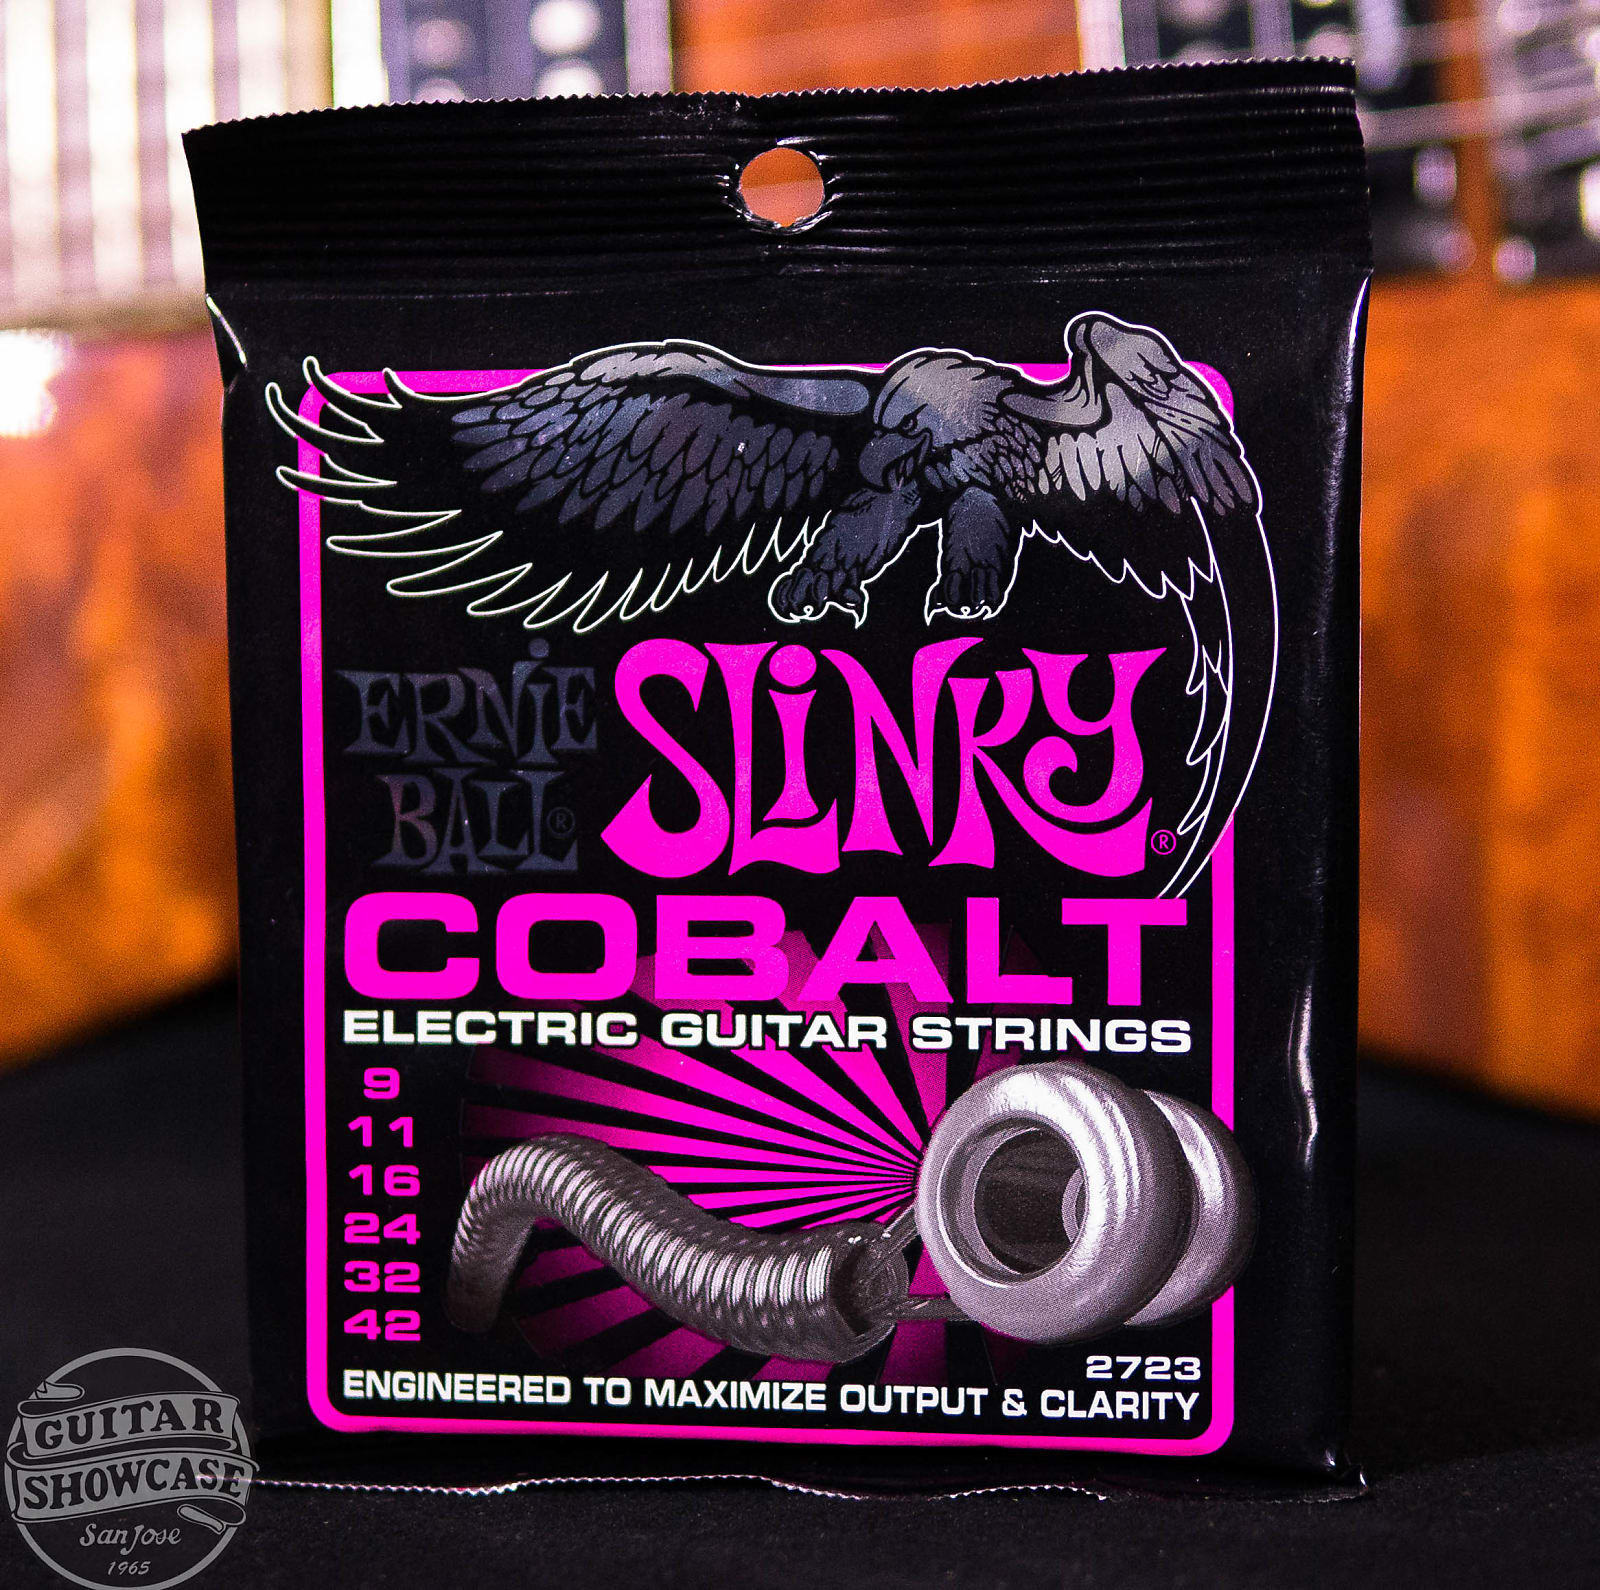 Ernie Ball 2723 Cobalt Super Slinky 009-042